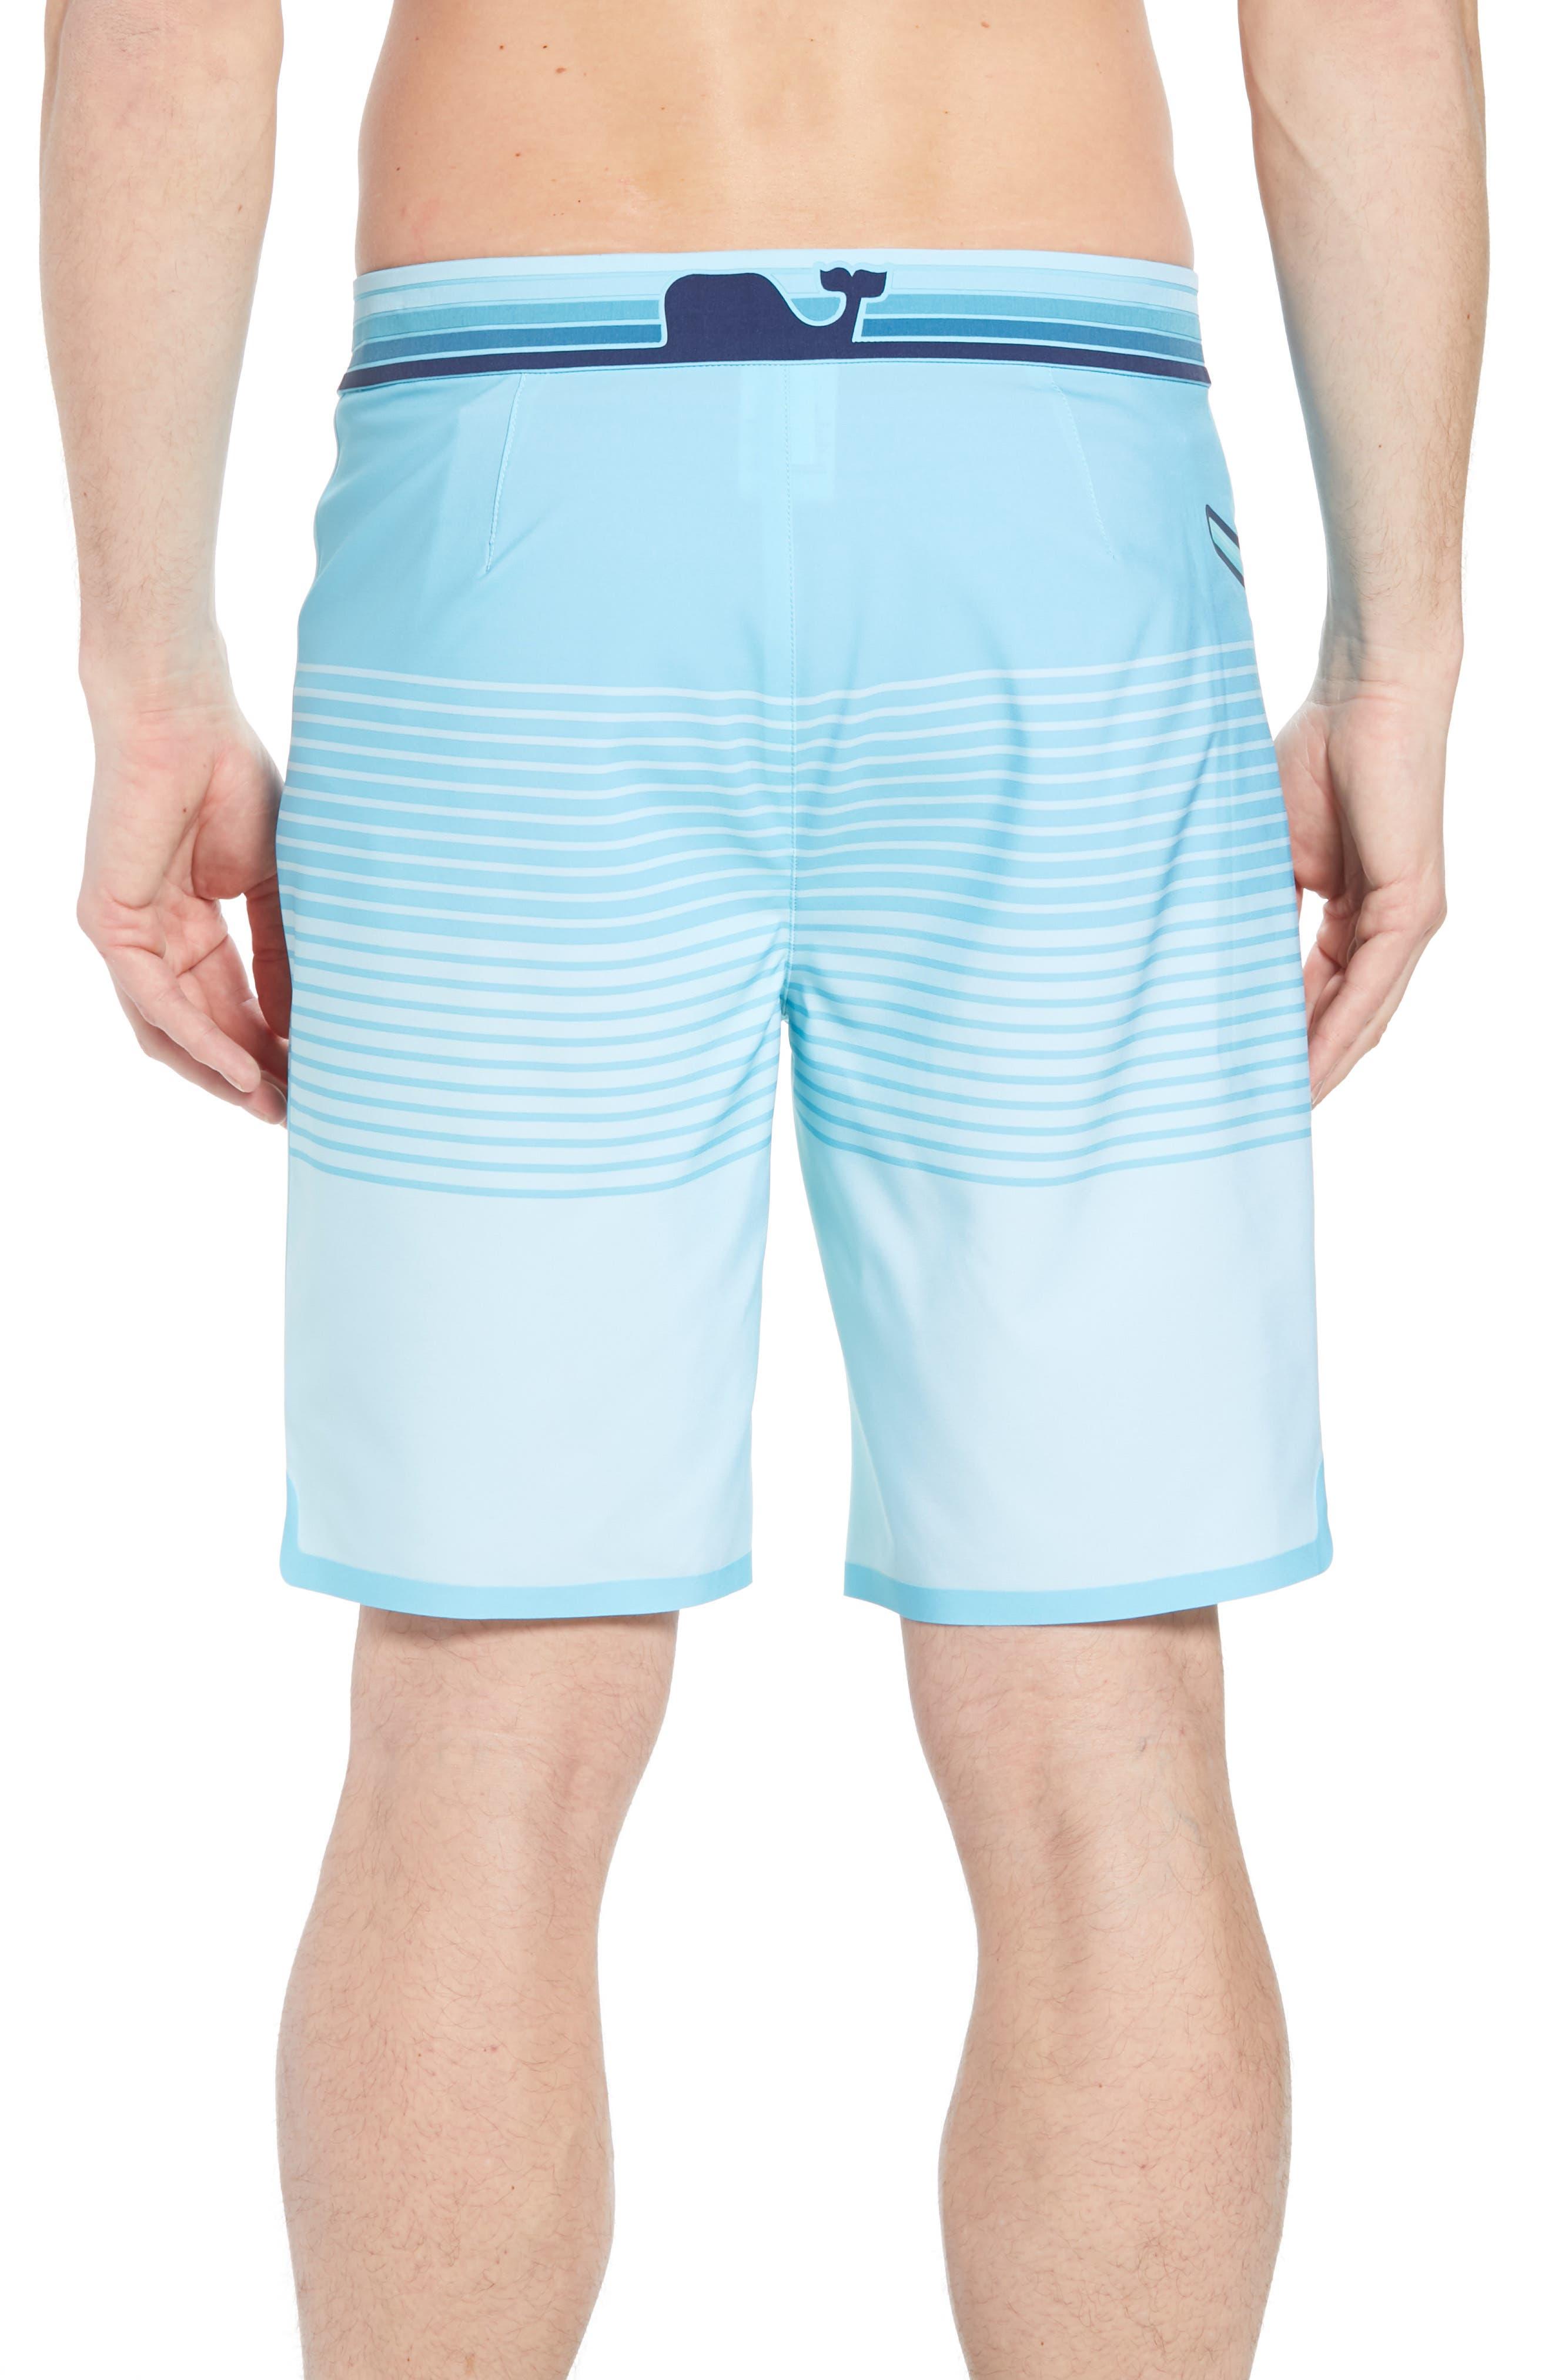 VINEYARD VINES,                             Sculplin Stripe Tech Board Shorts,                             Alternate thumbnail 2, color,                             459